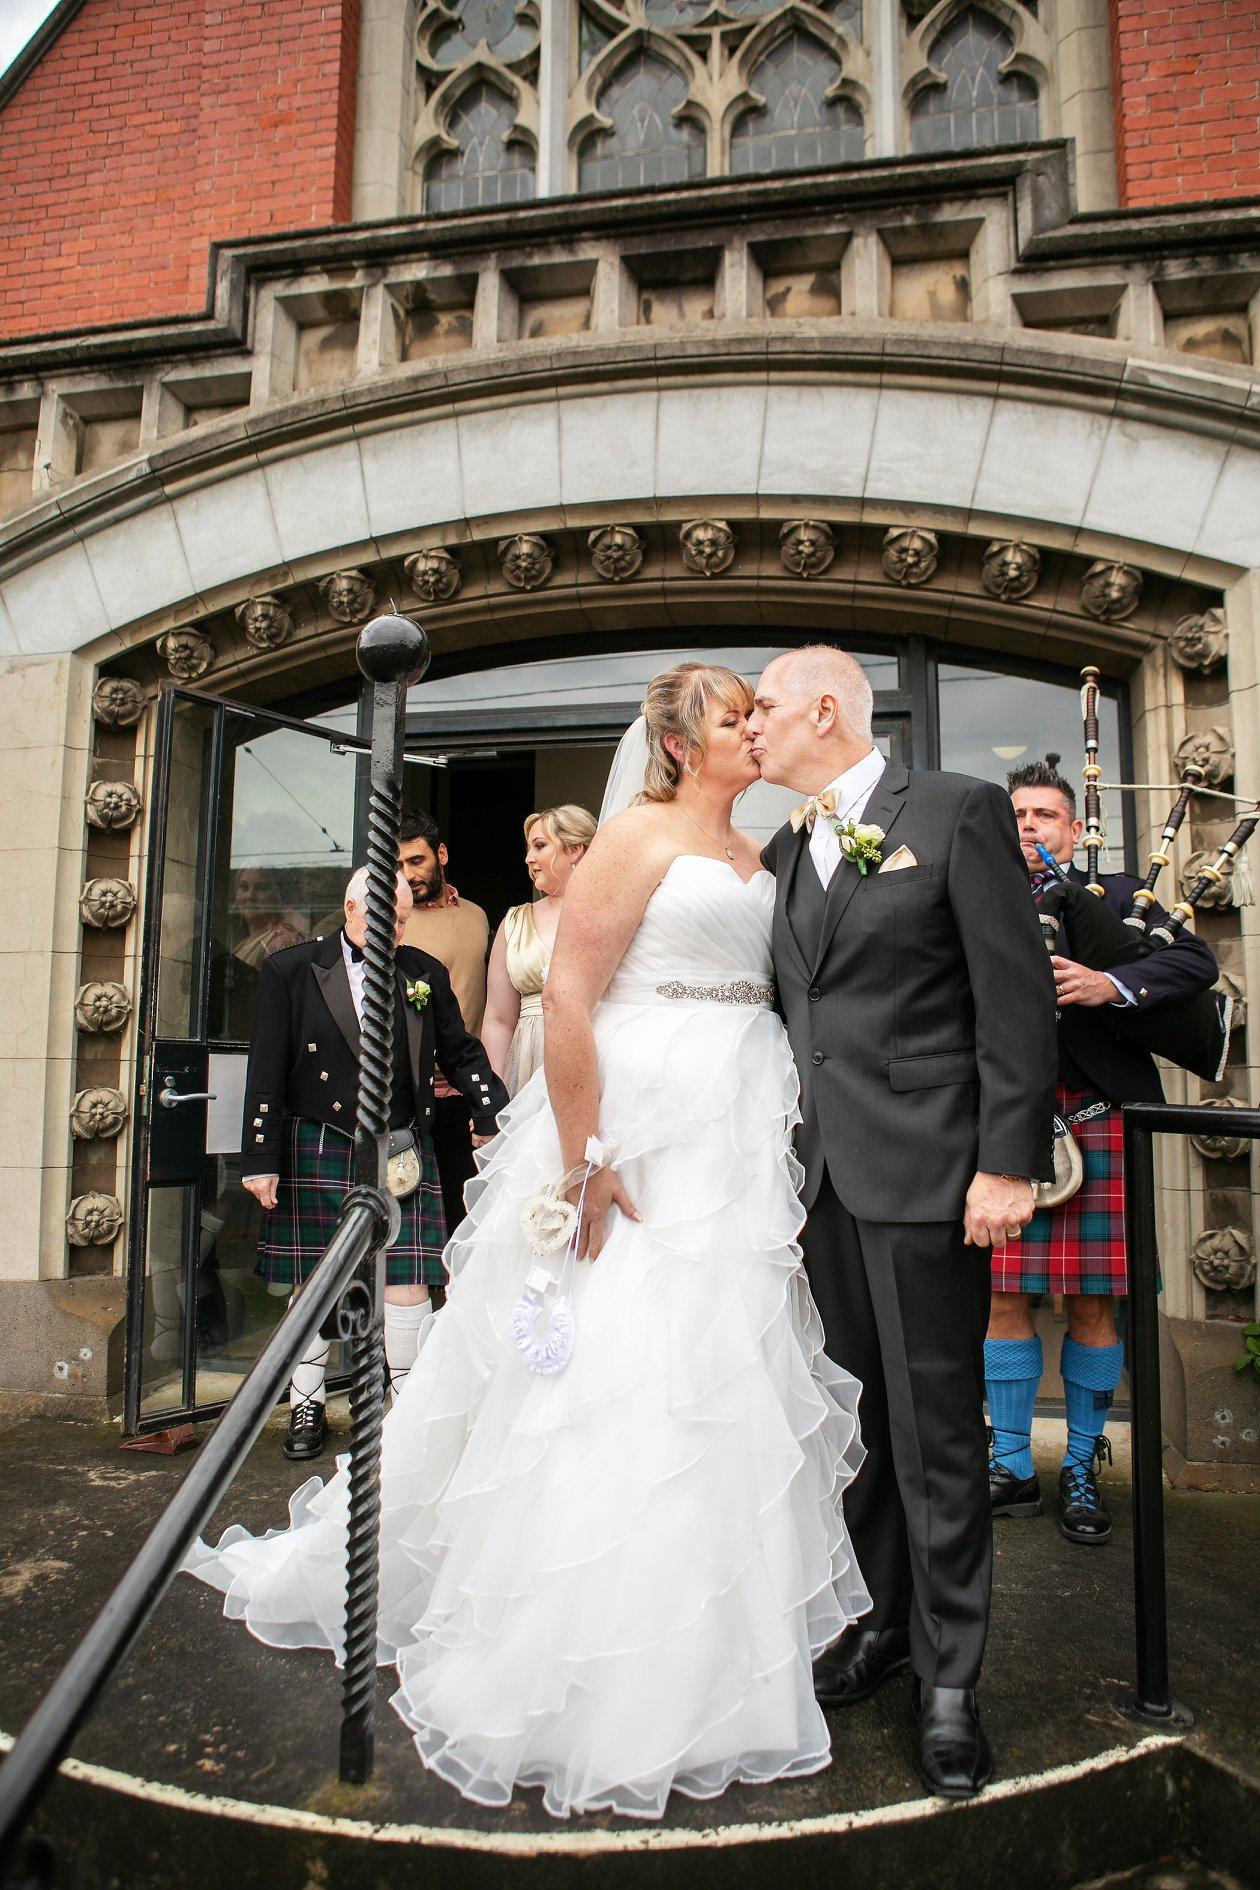 Bridal dress changes